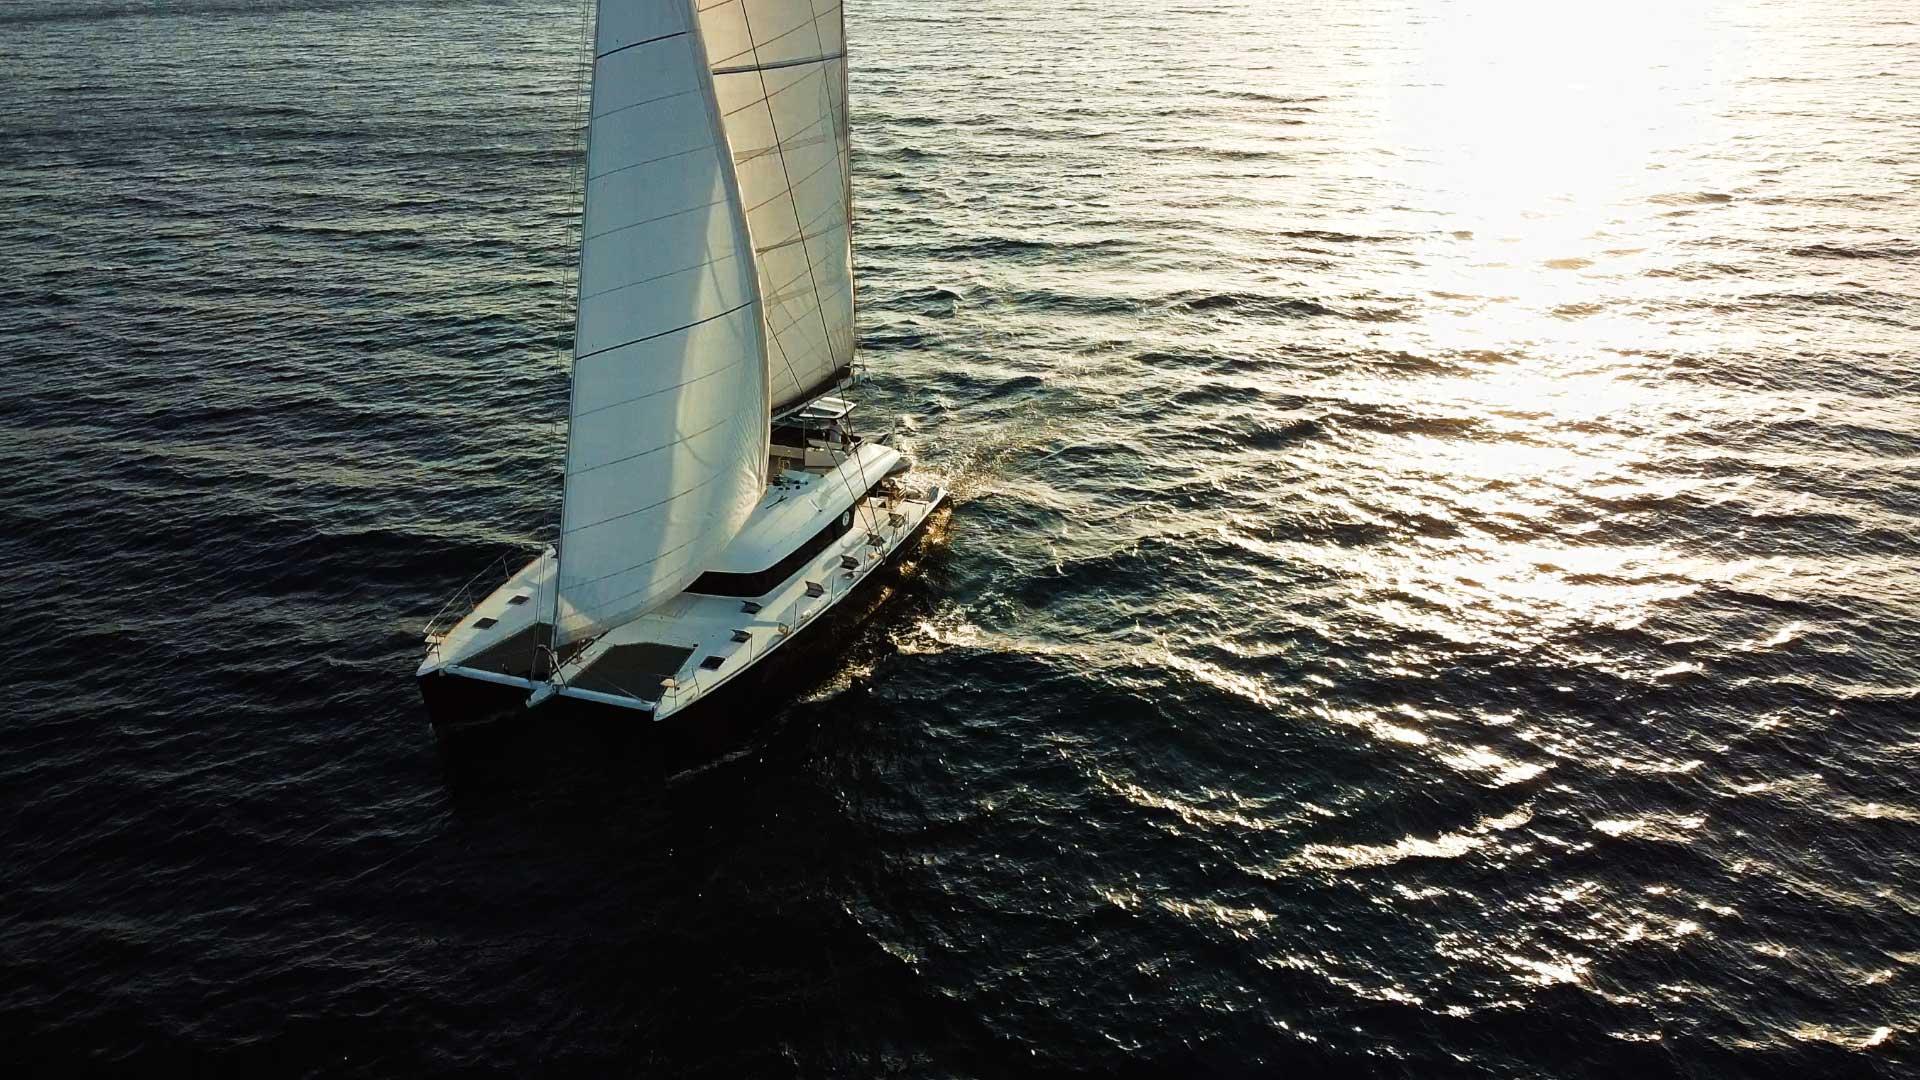 kaskazi sailing